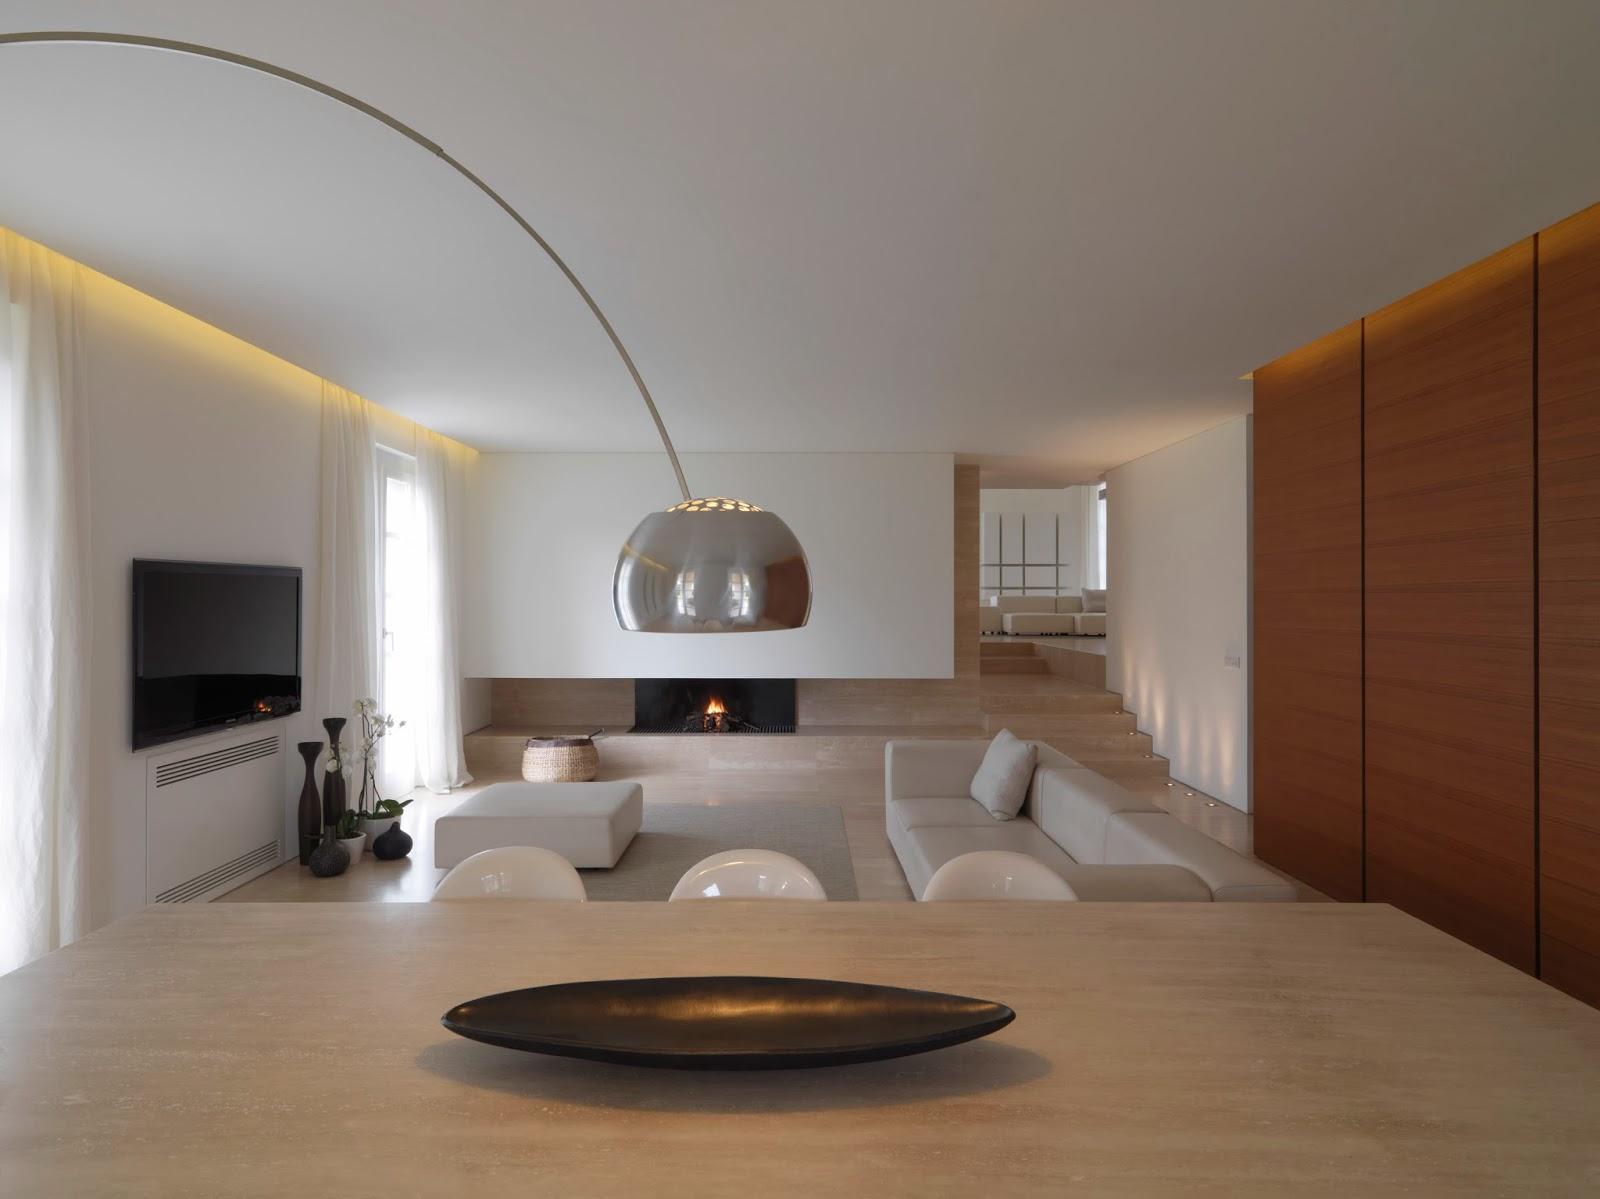 Hometrotter home style blog casa arredamento design for Arredamento minimal legno